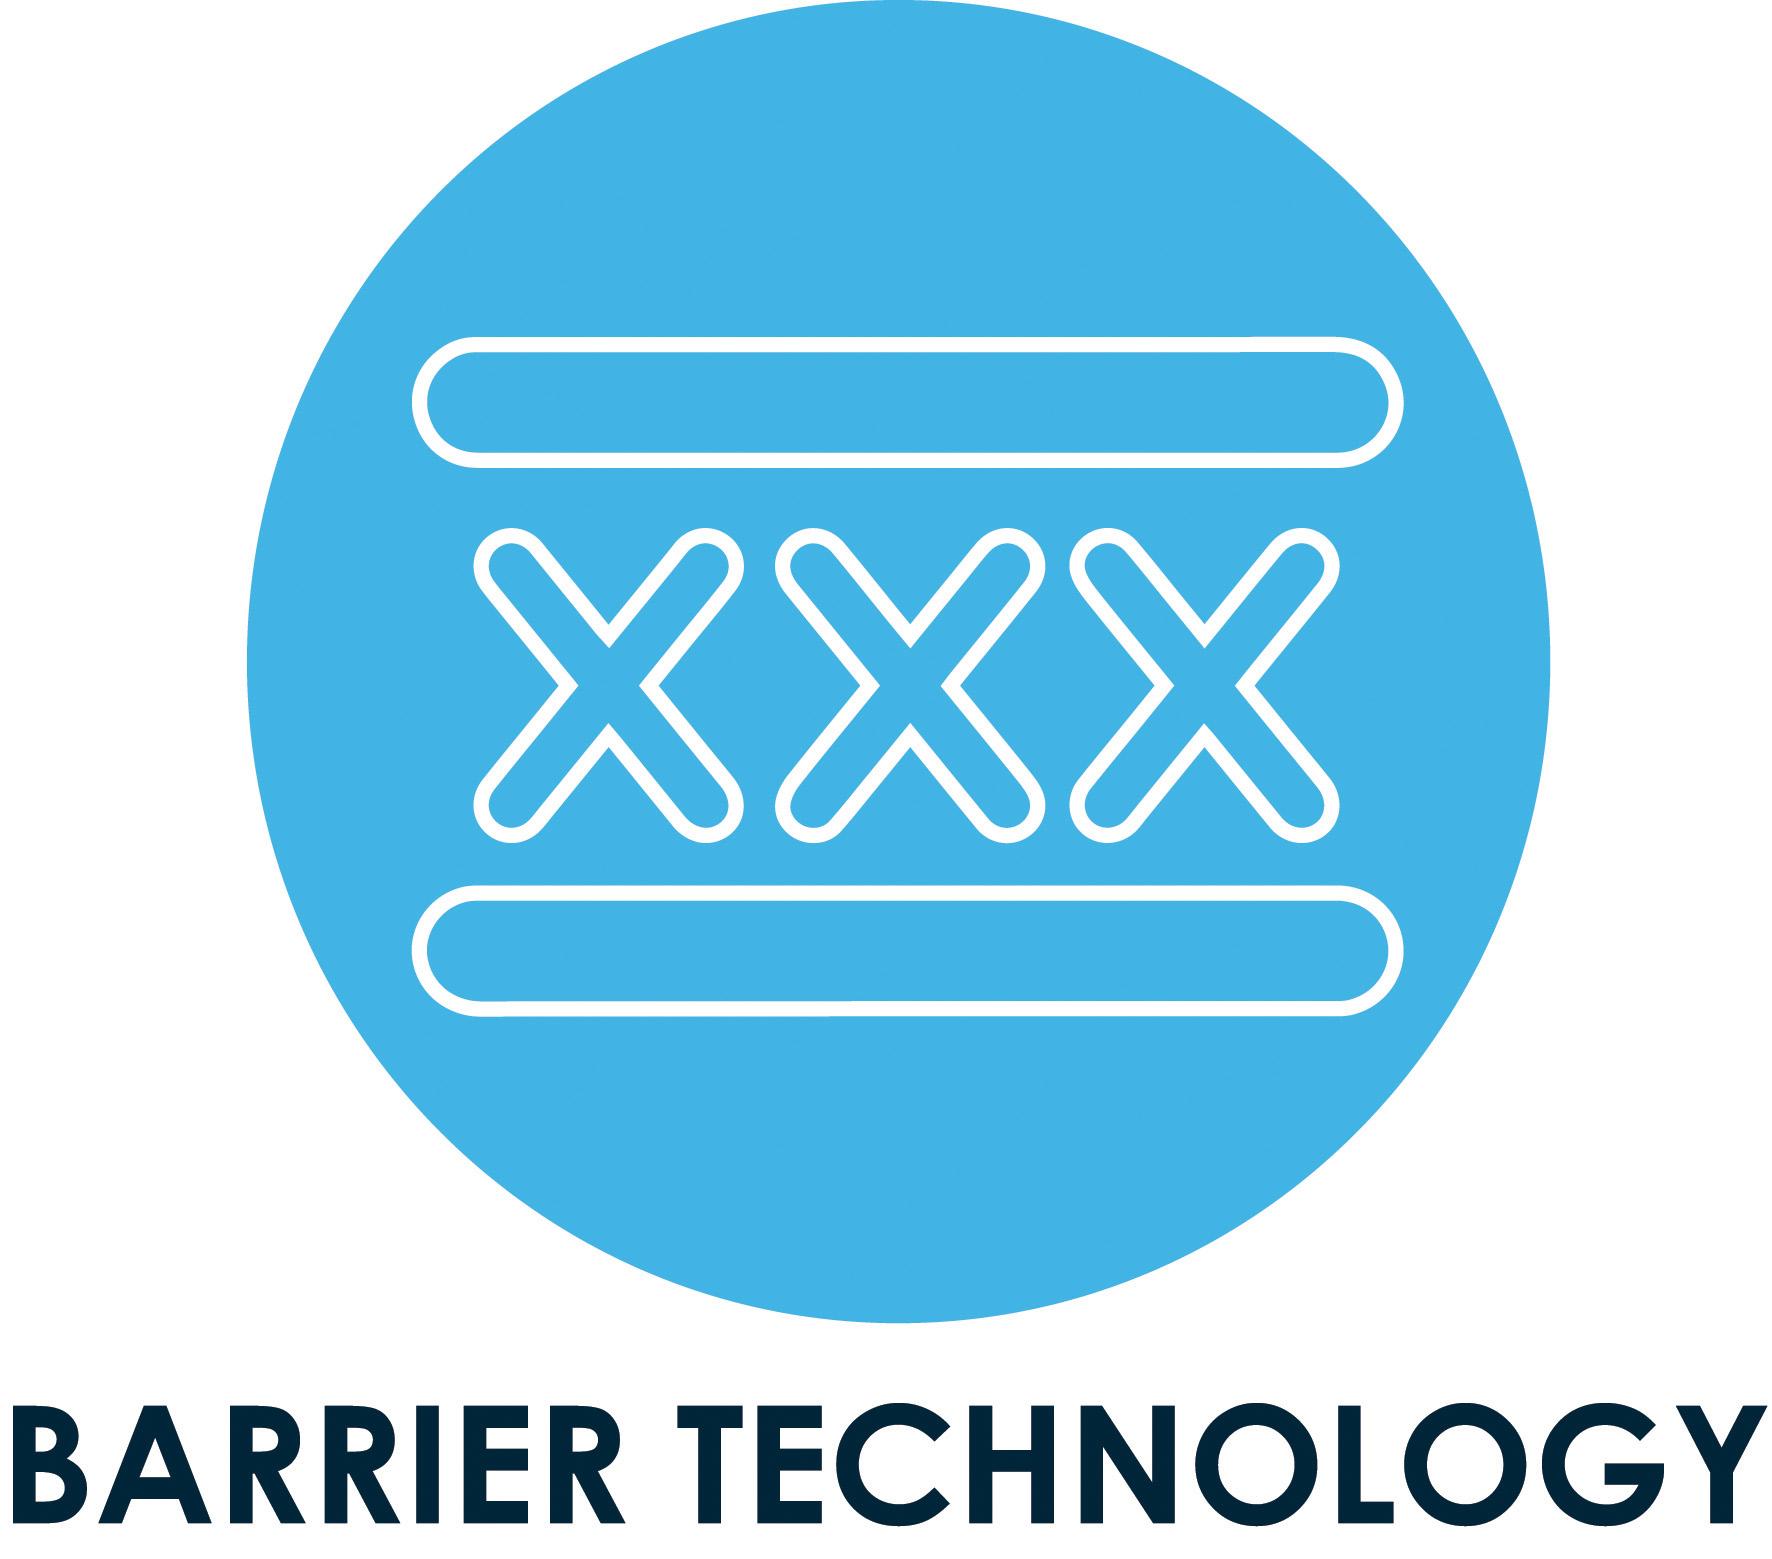 Rhino barrier technology